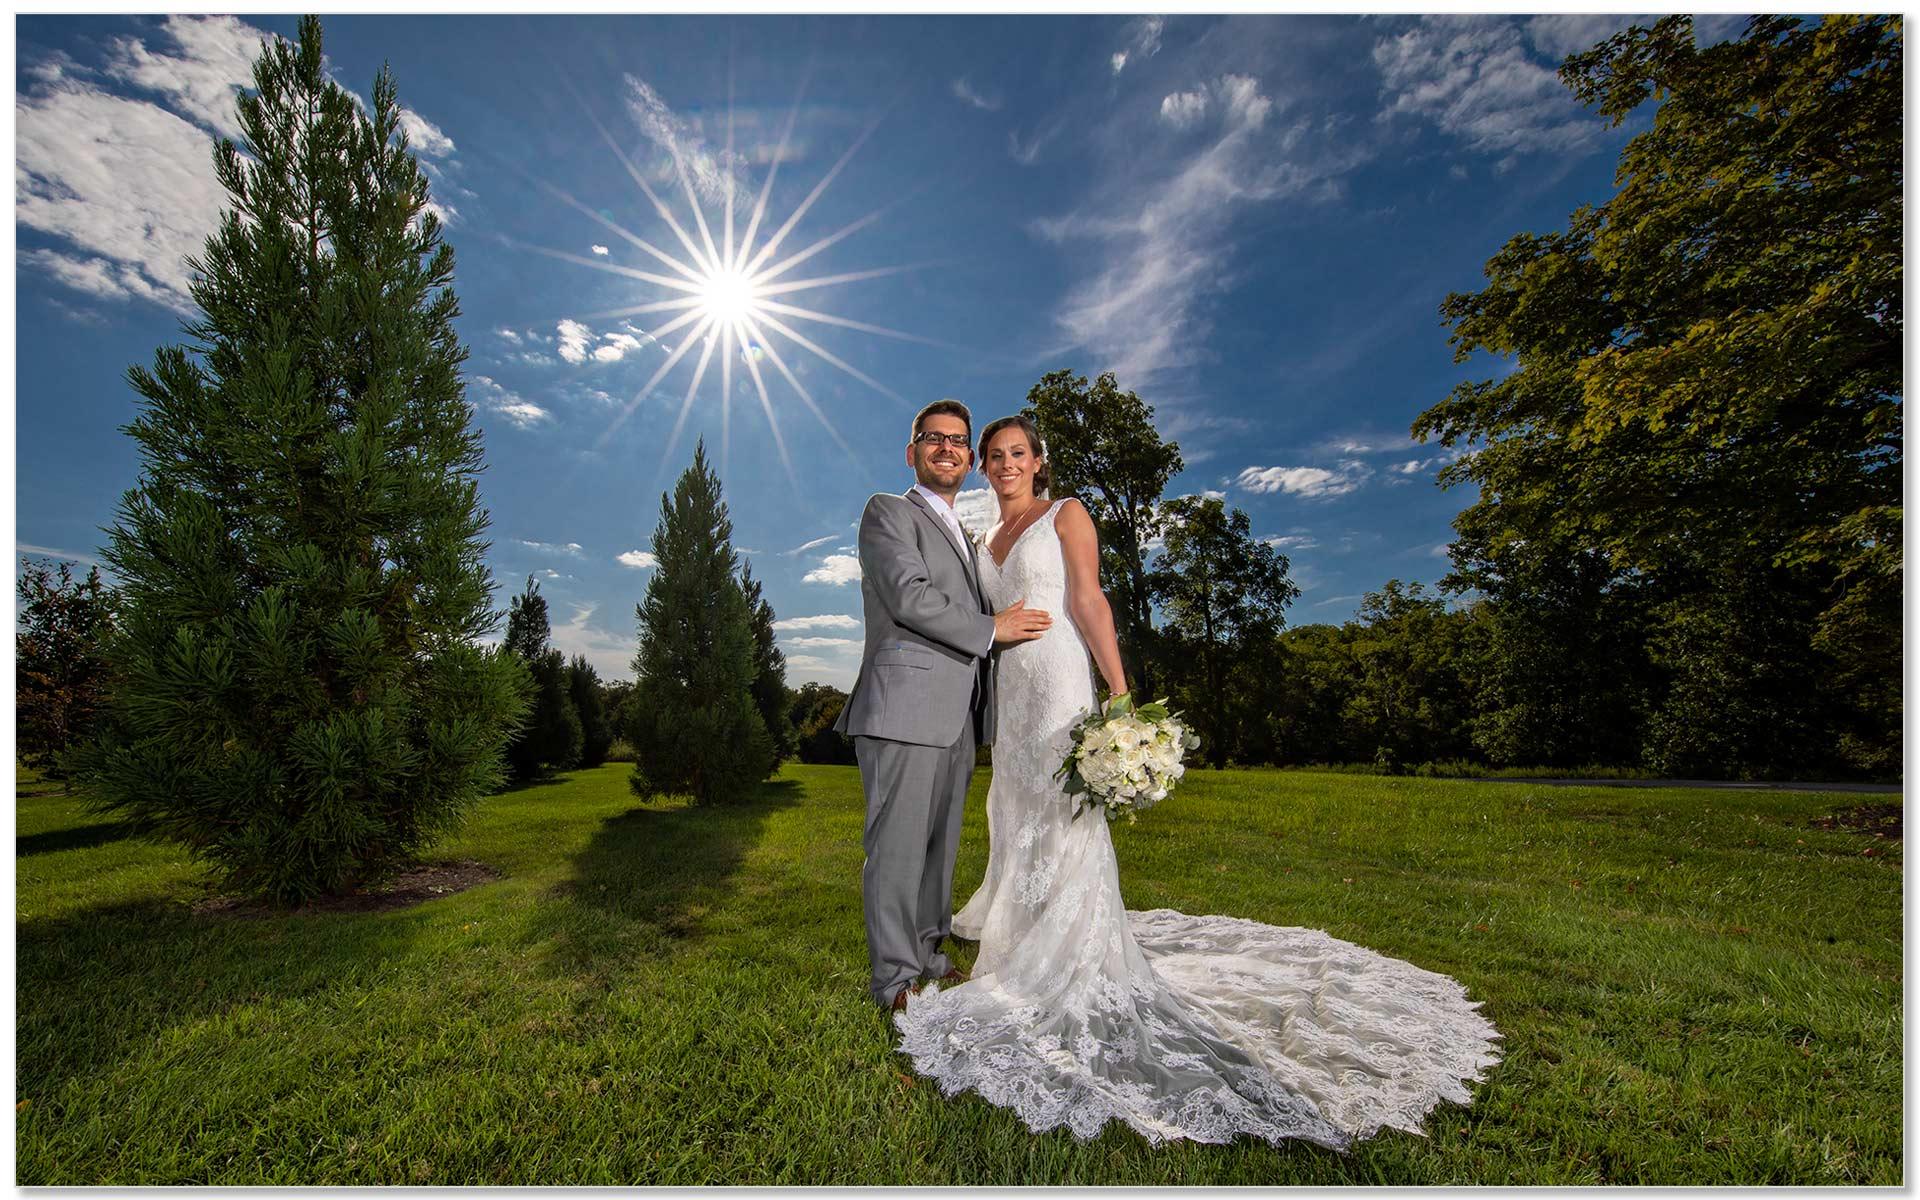 French House Cincinnati Park Events Wedding